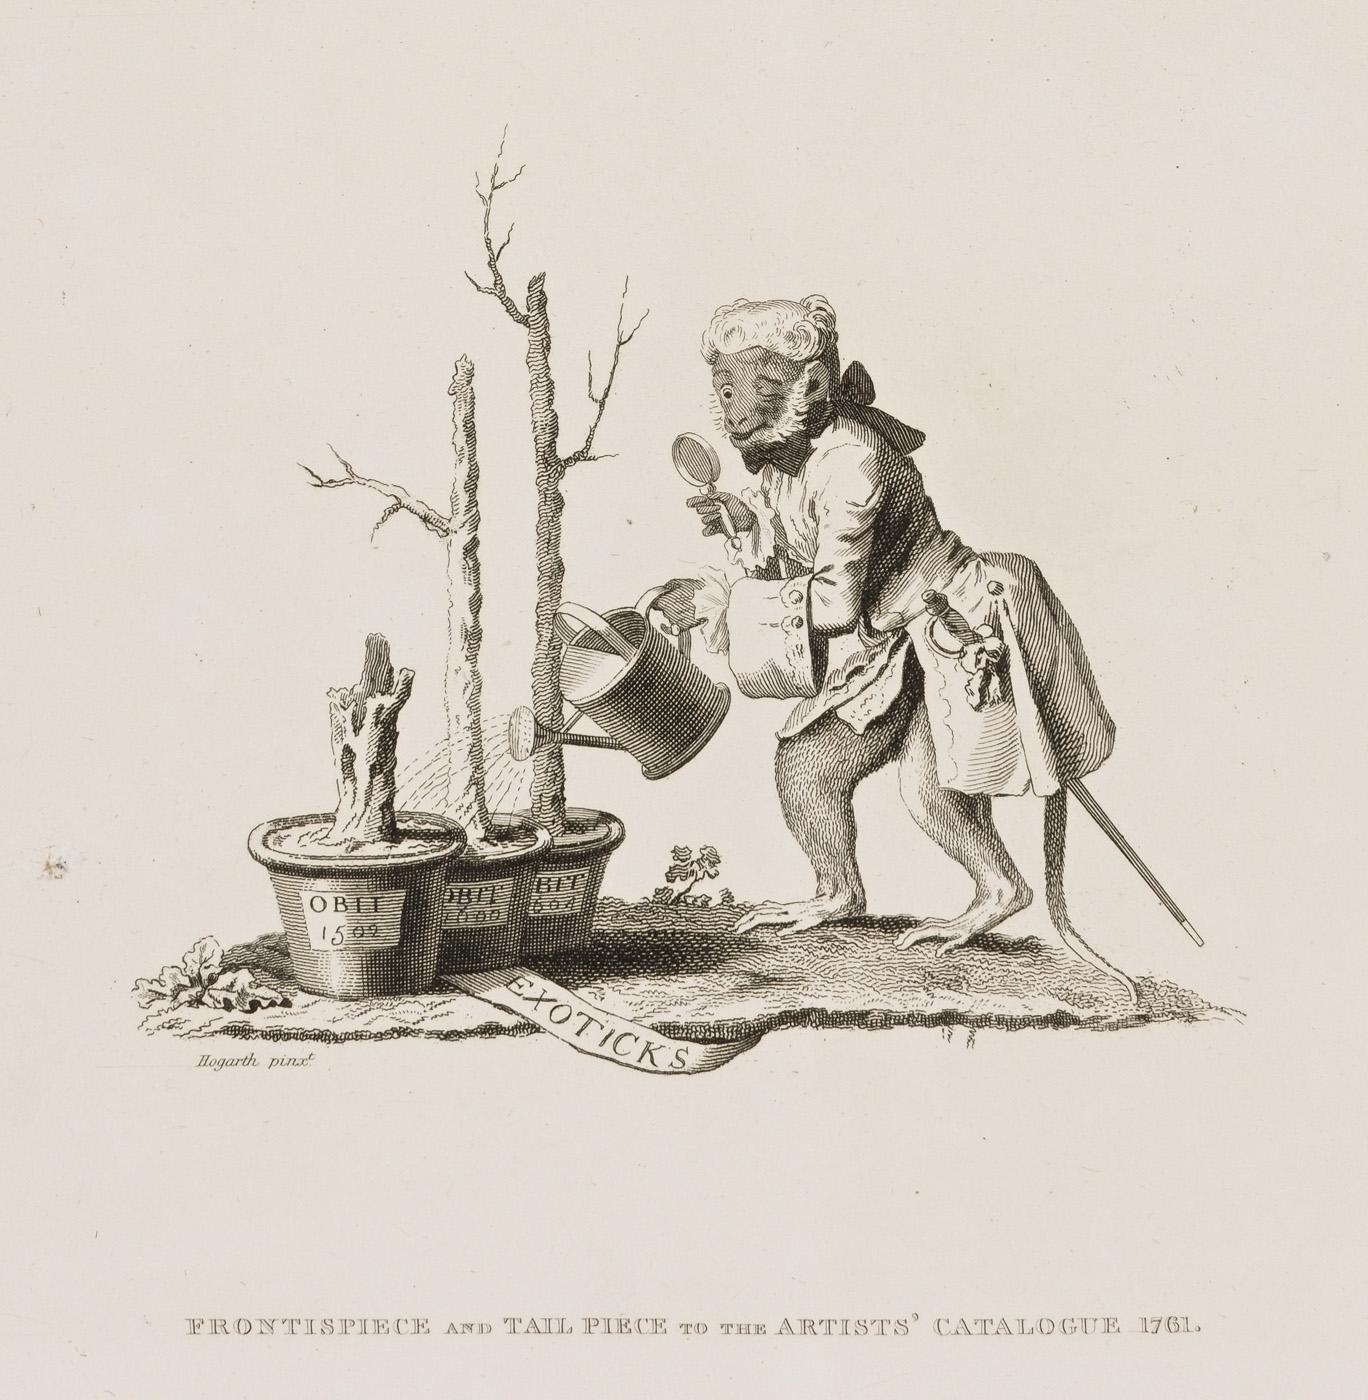 William Hogarth - The Artists Catalogue II